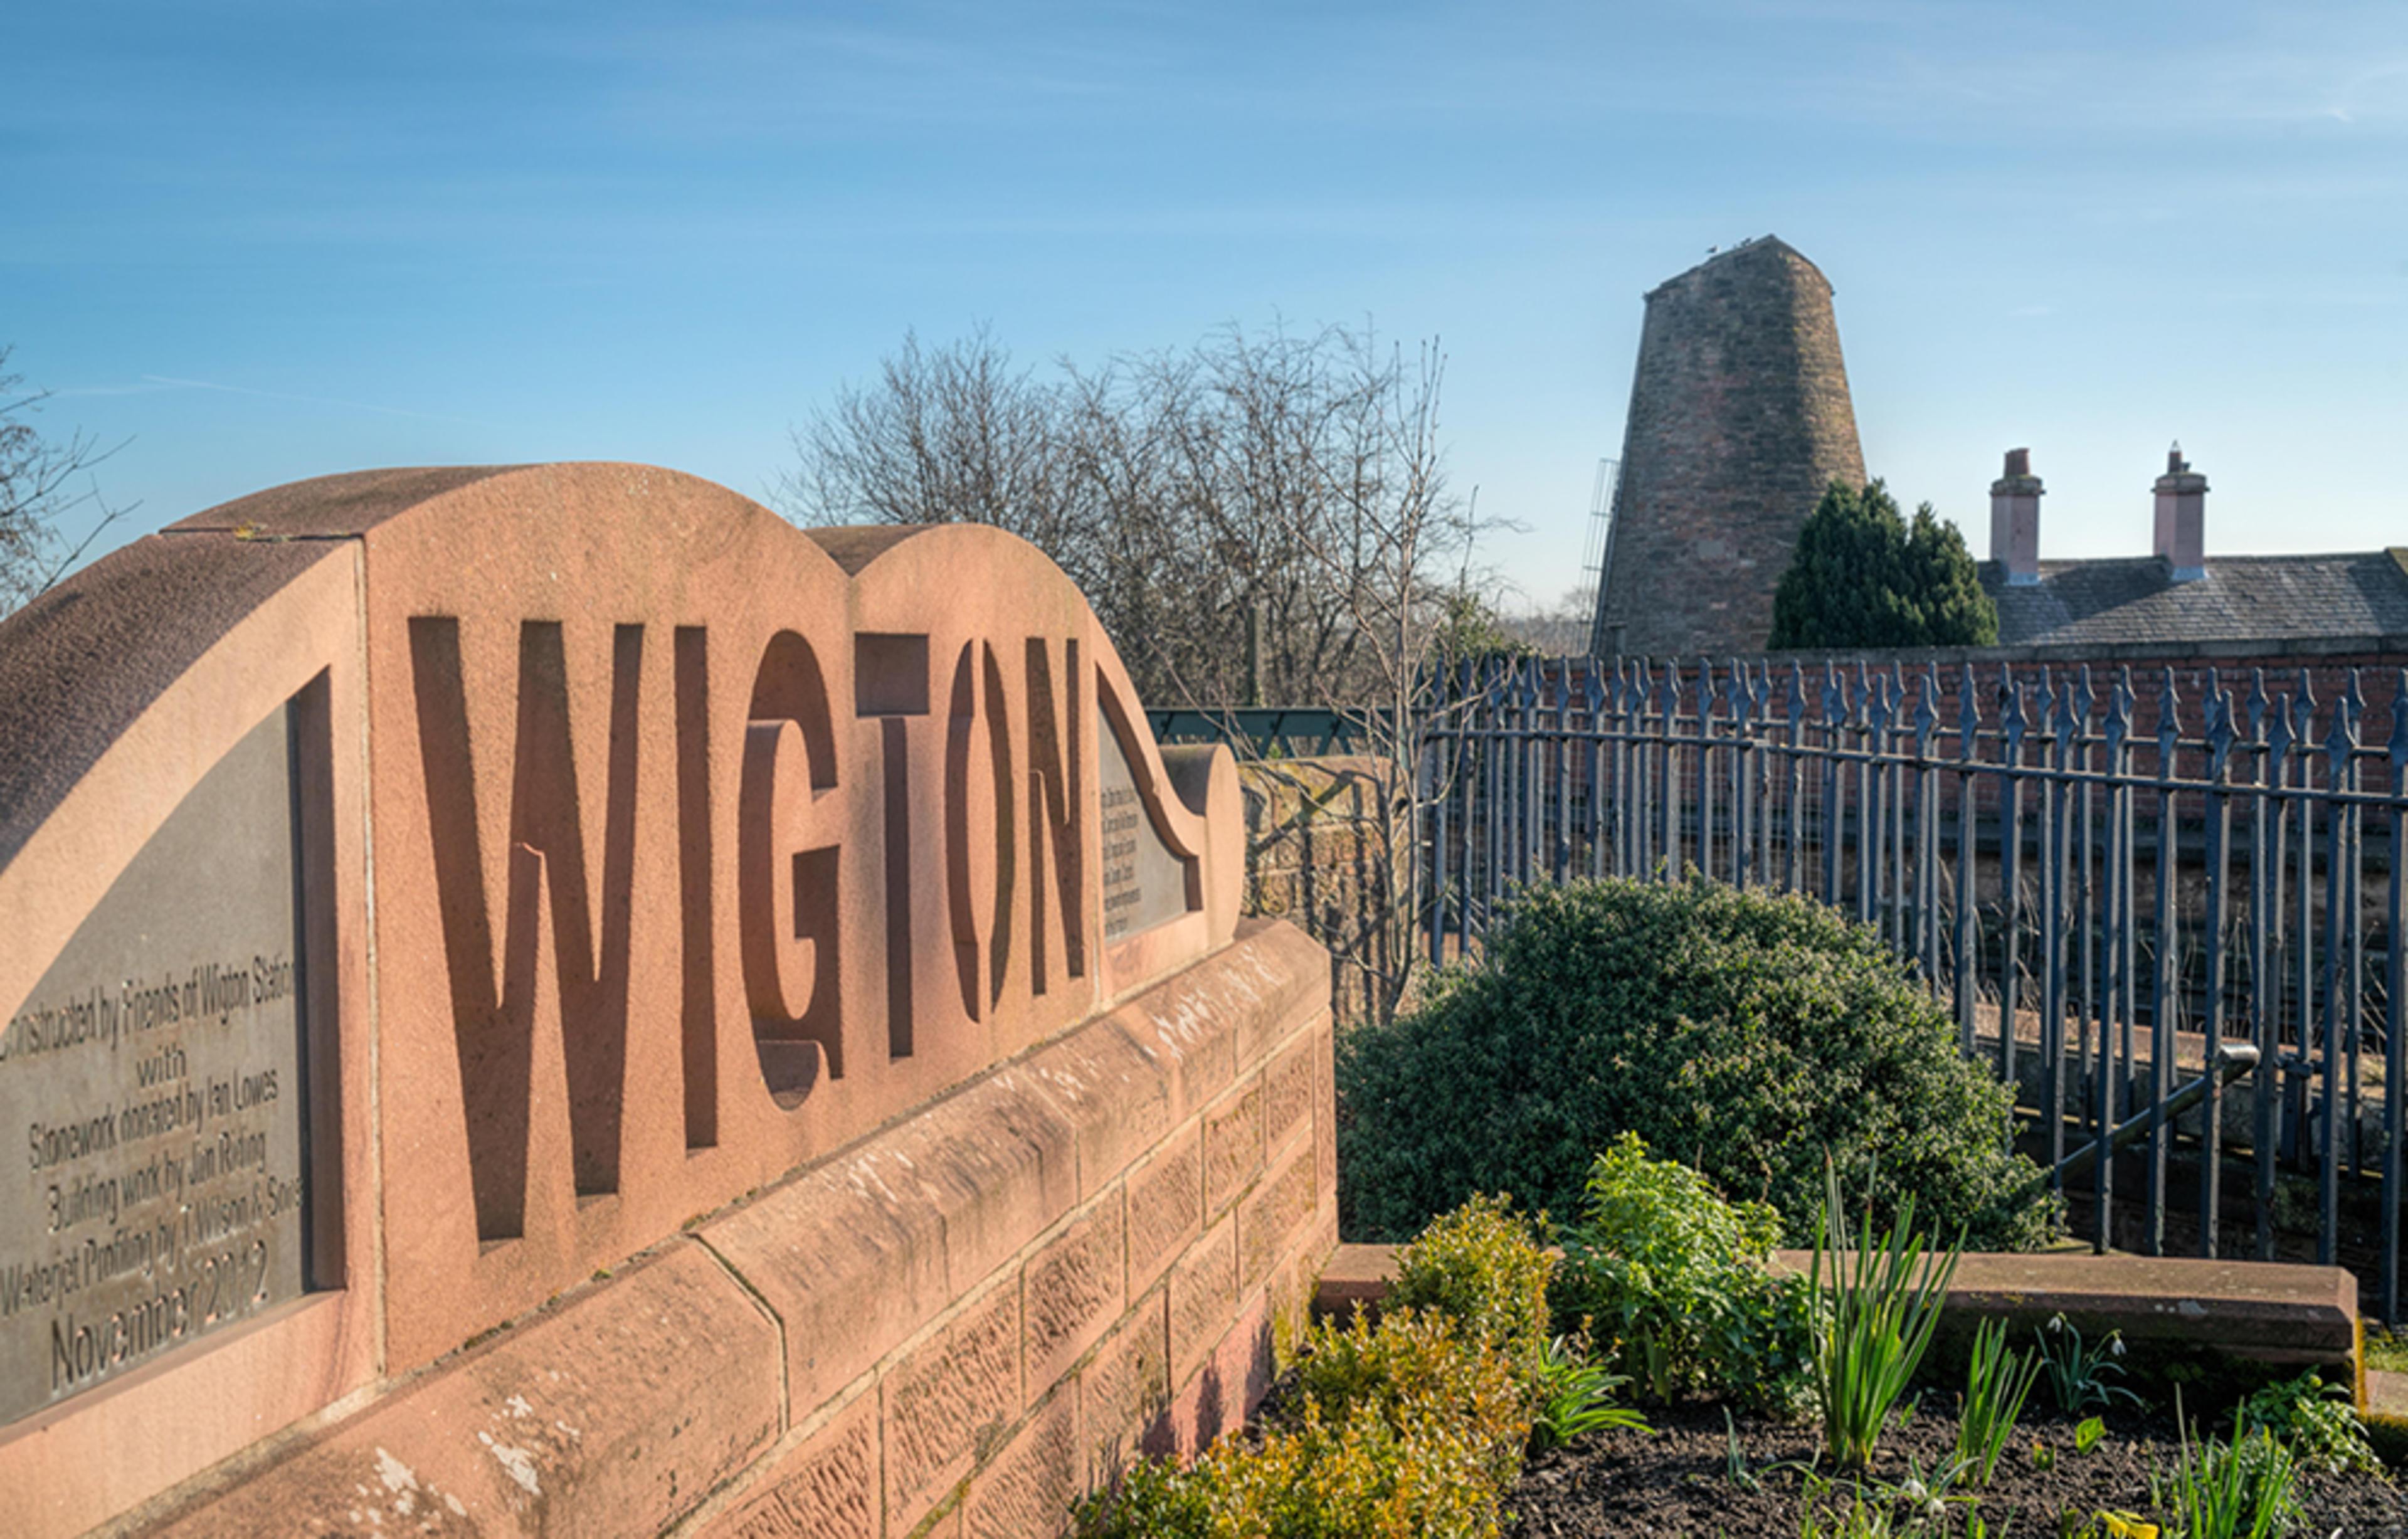 woolner-brook-wigton-development-local-area-2